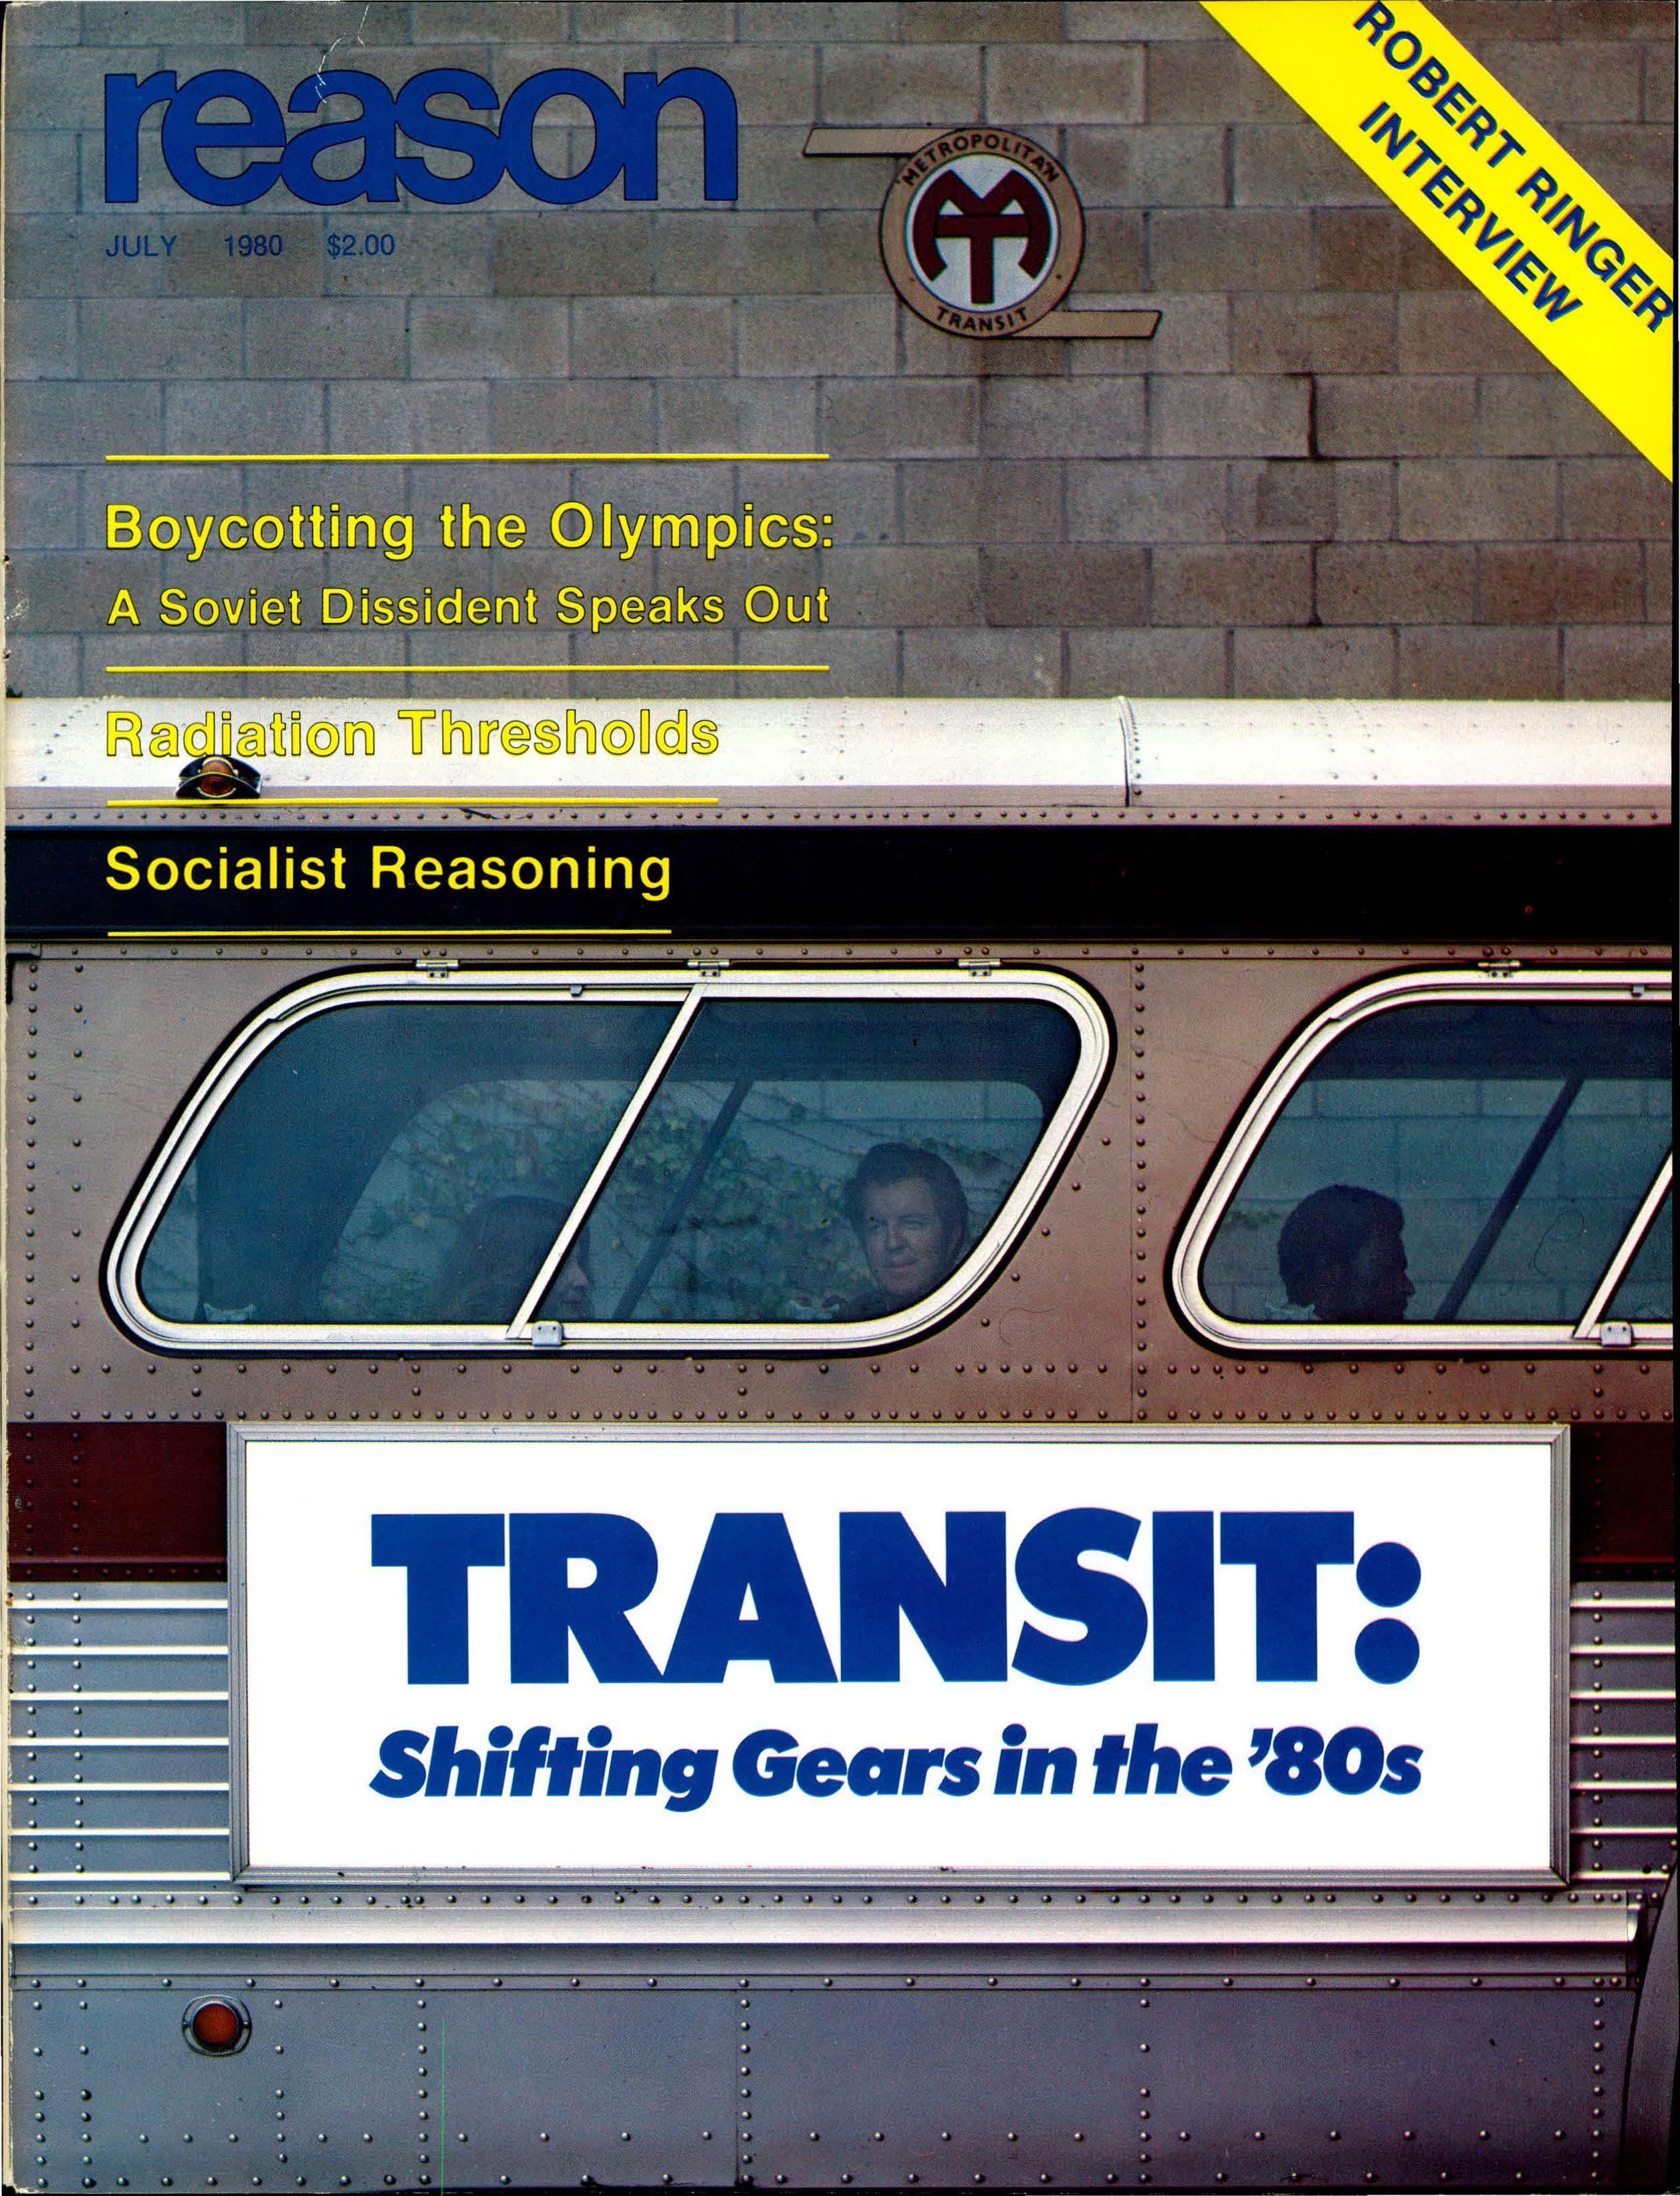 Reason Magazine, July 1980 cover image